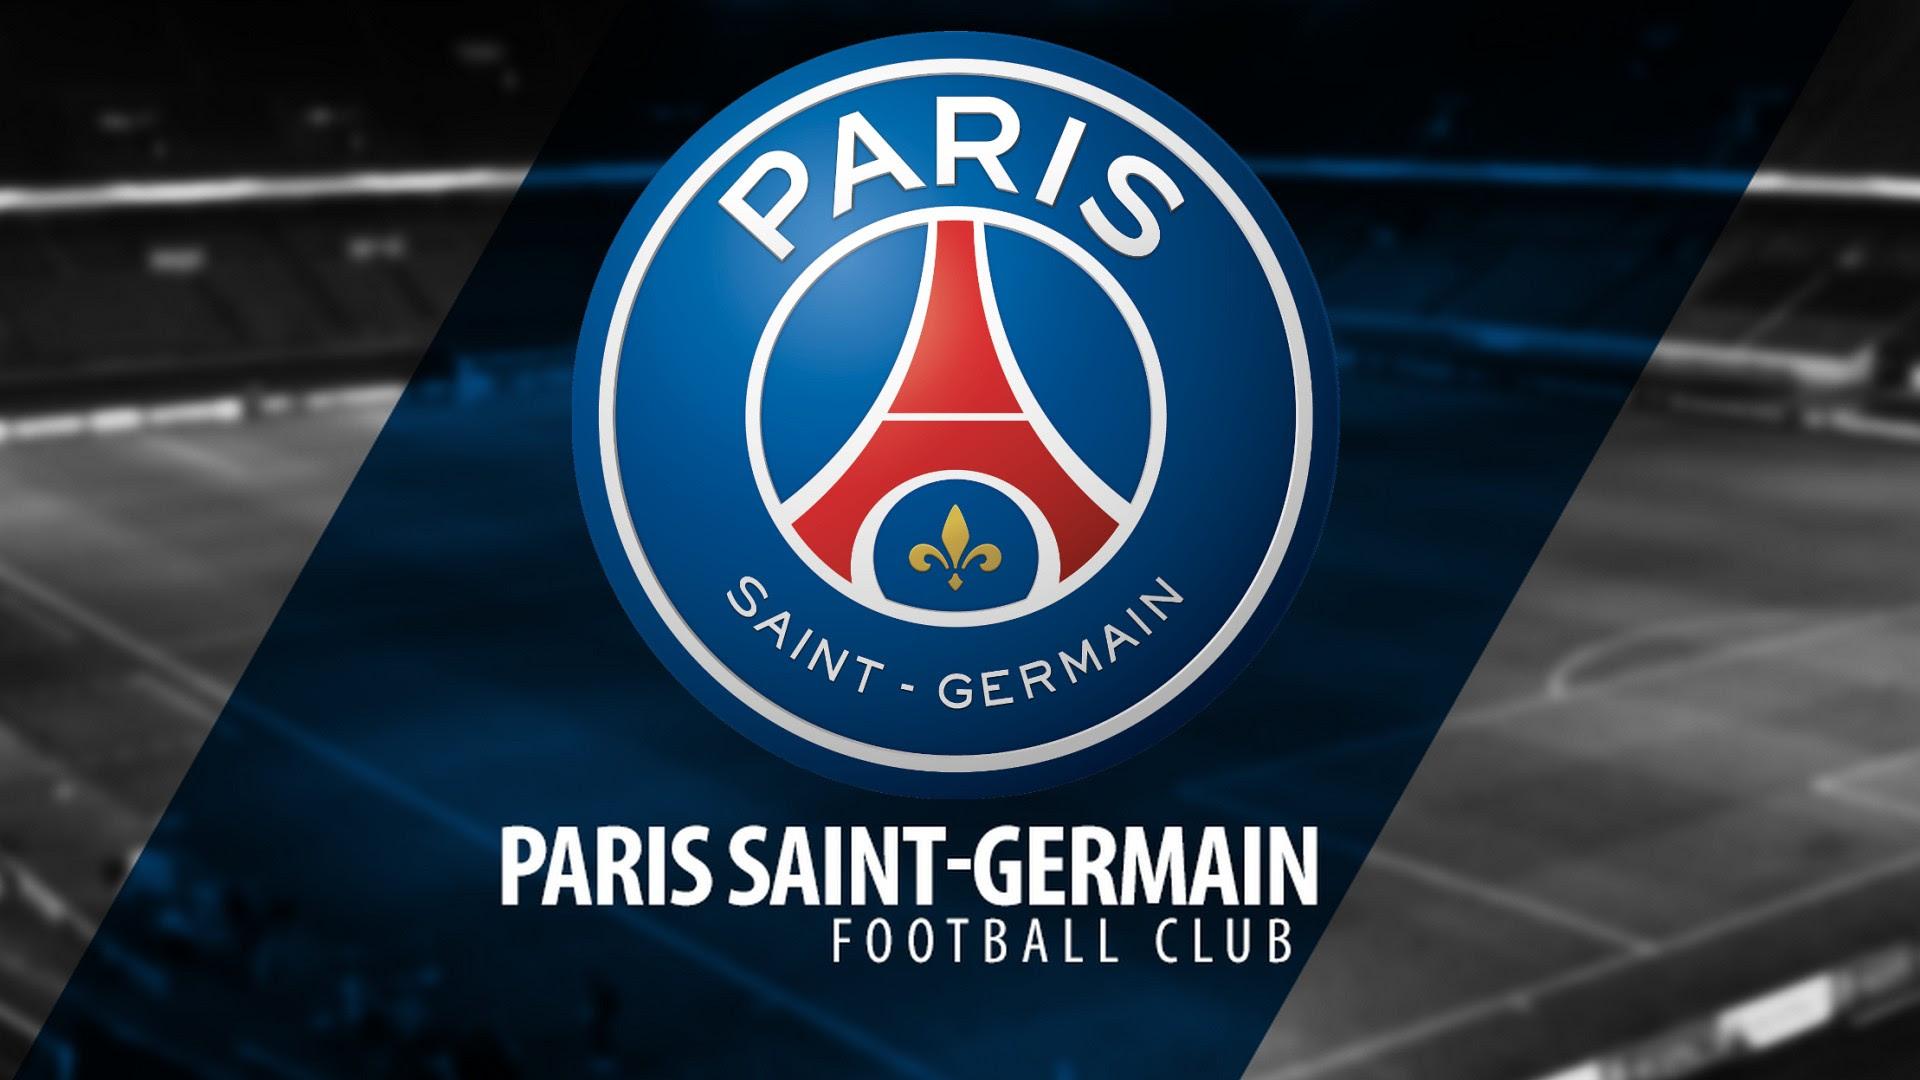 Paris Saint-Germain Wallpaper HD | 2019 Football Wallpaper